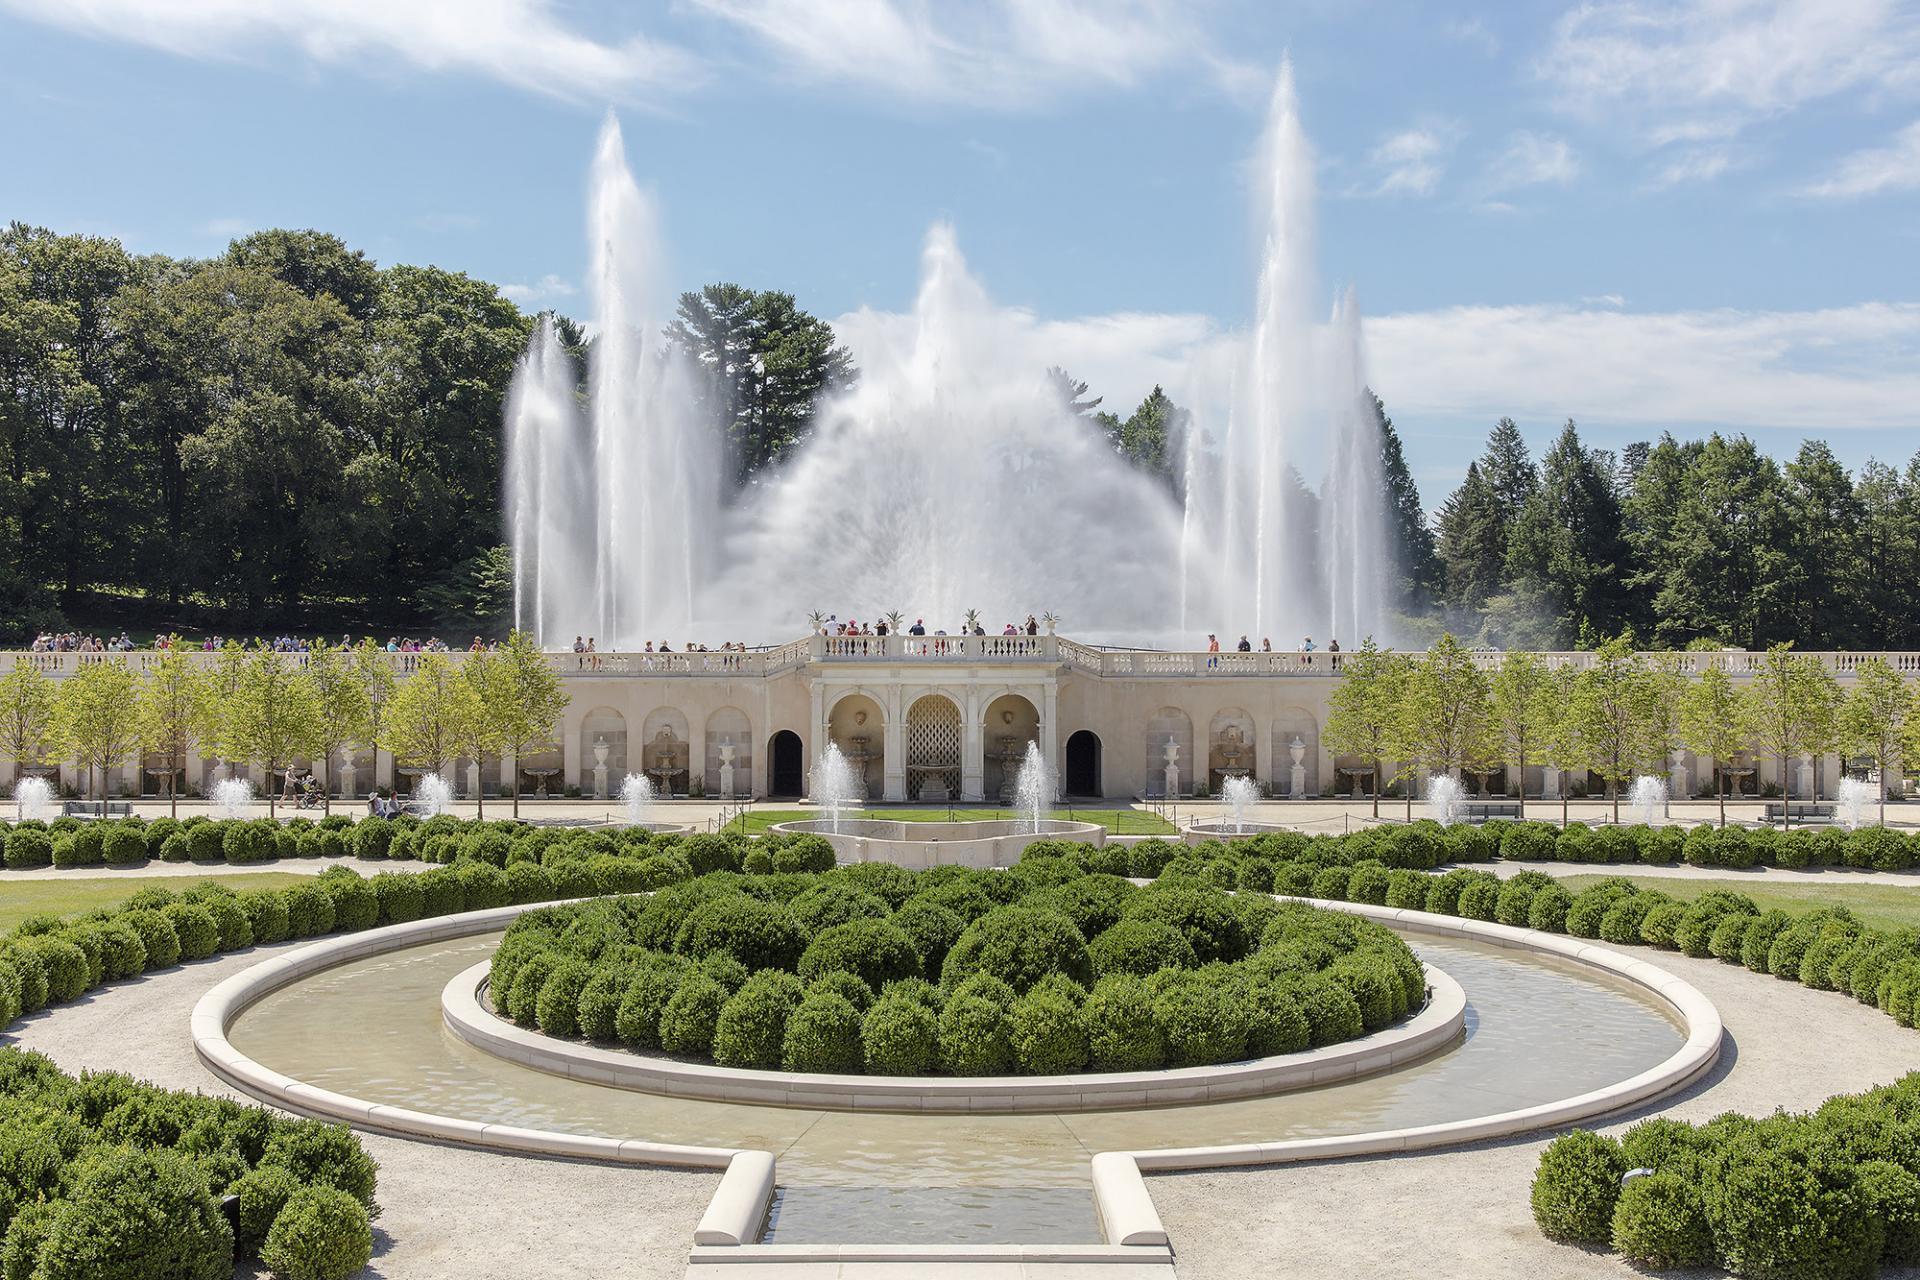 Landscape Fountain Public  The Revitalized Main Fountain Garden at Longwood